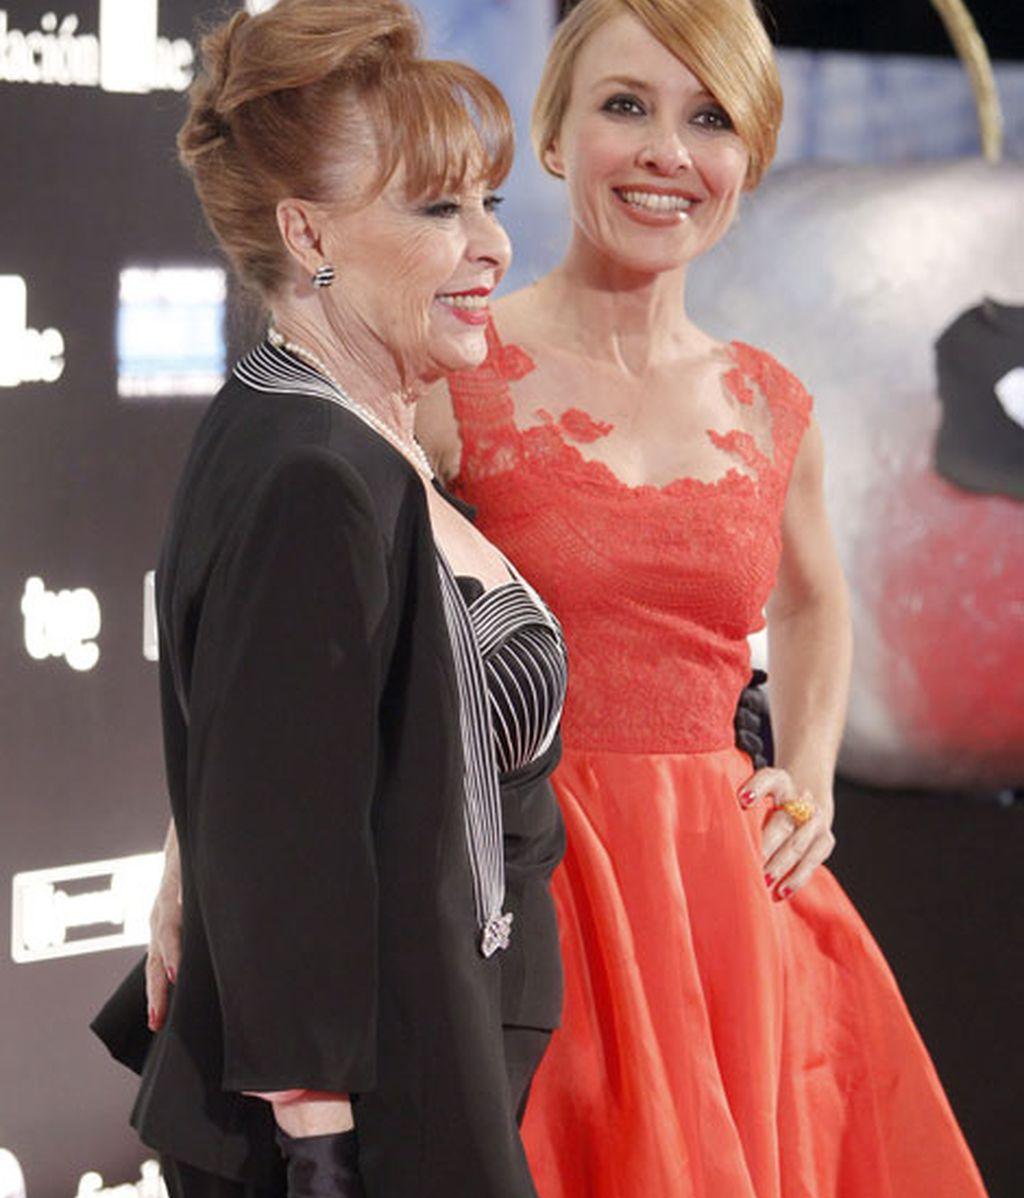 Cayetana Guillén Cuervo y su madre, Gemma Cuervo